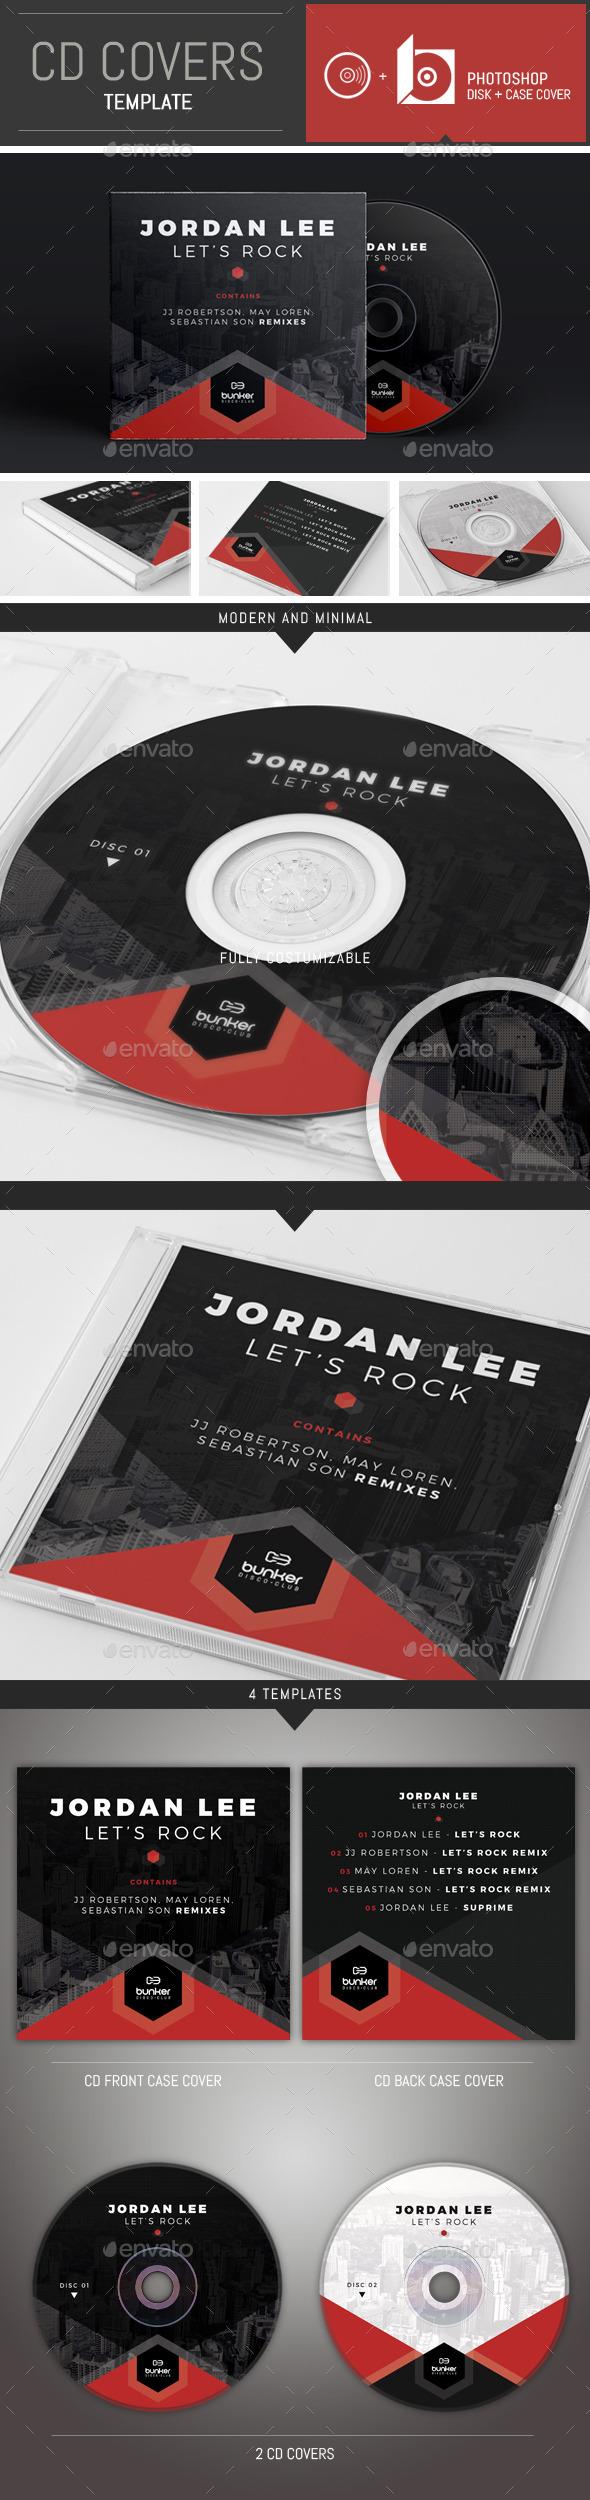 DJ Music Hexagon CD Cover Template - CD & DVD Artwork Print Templates